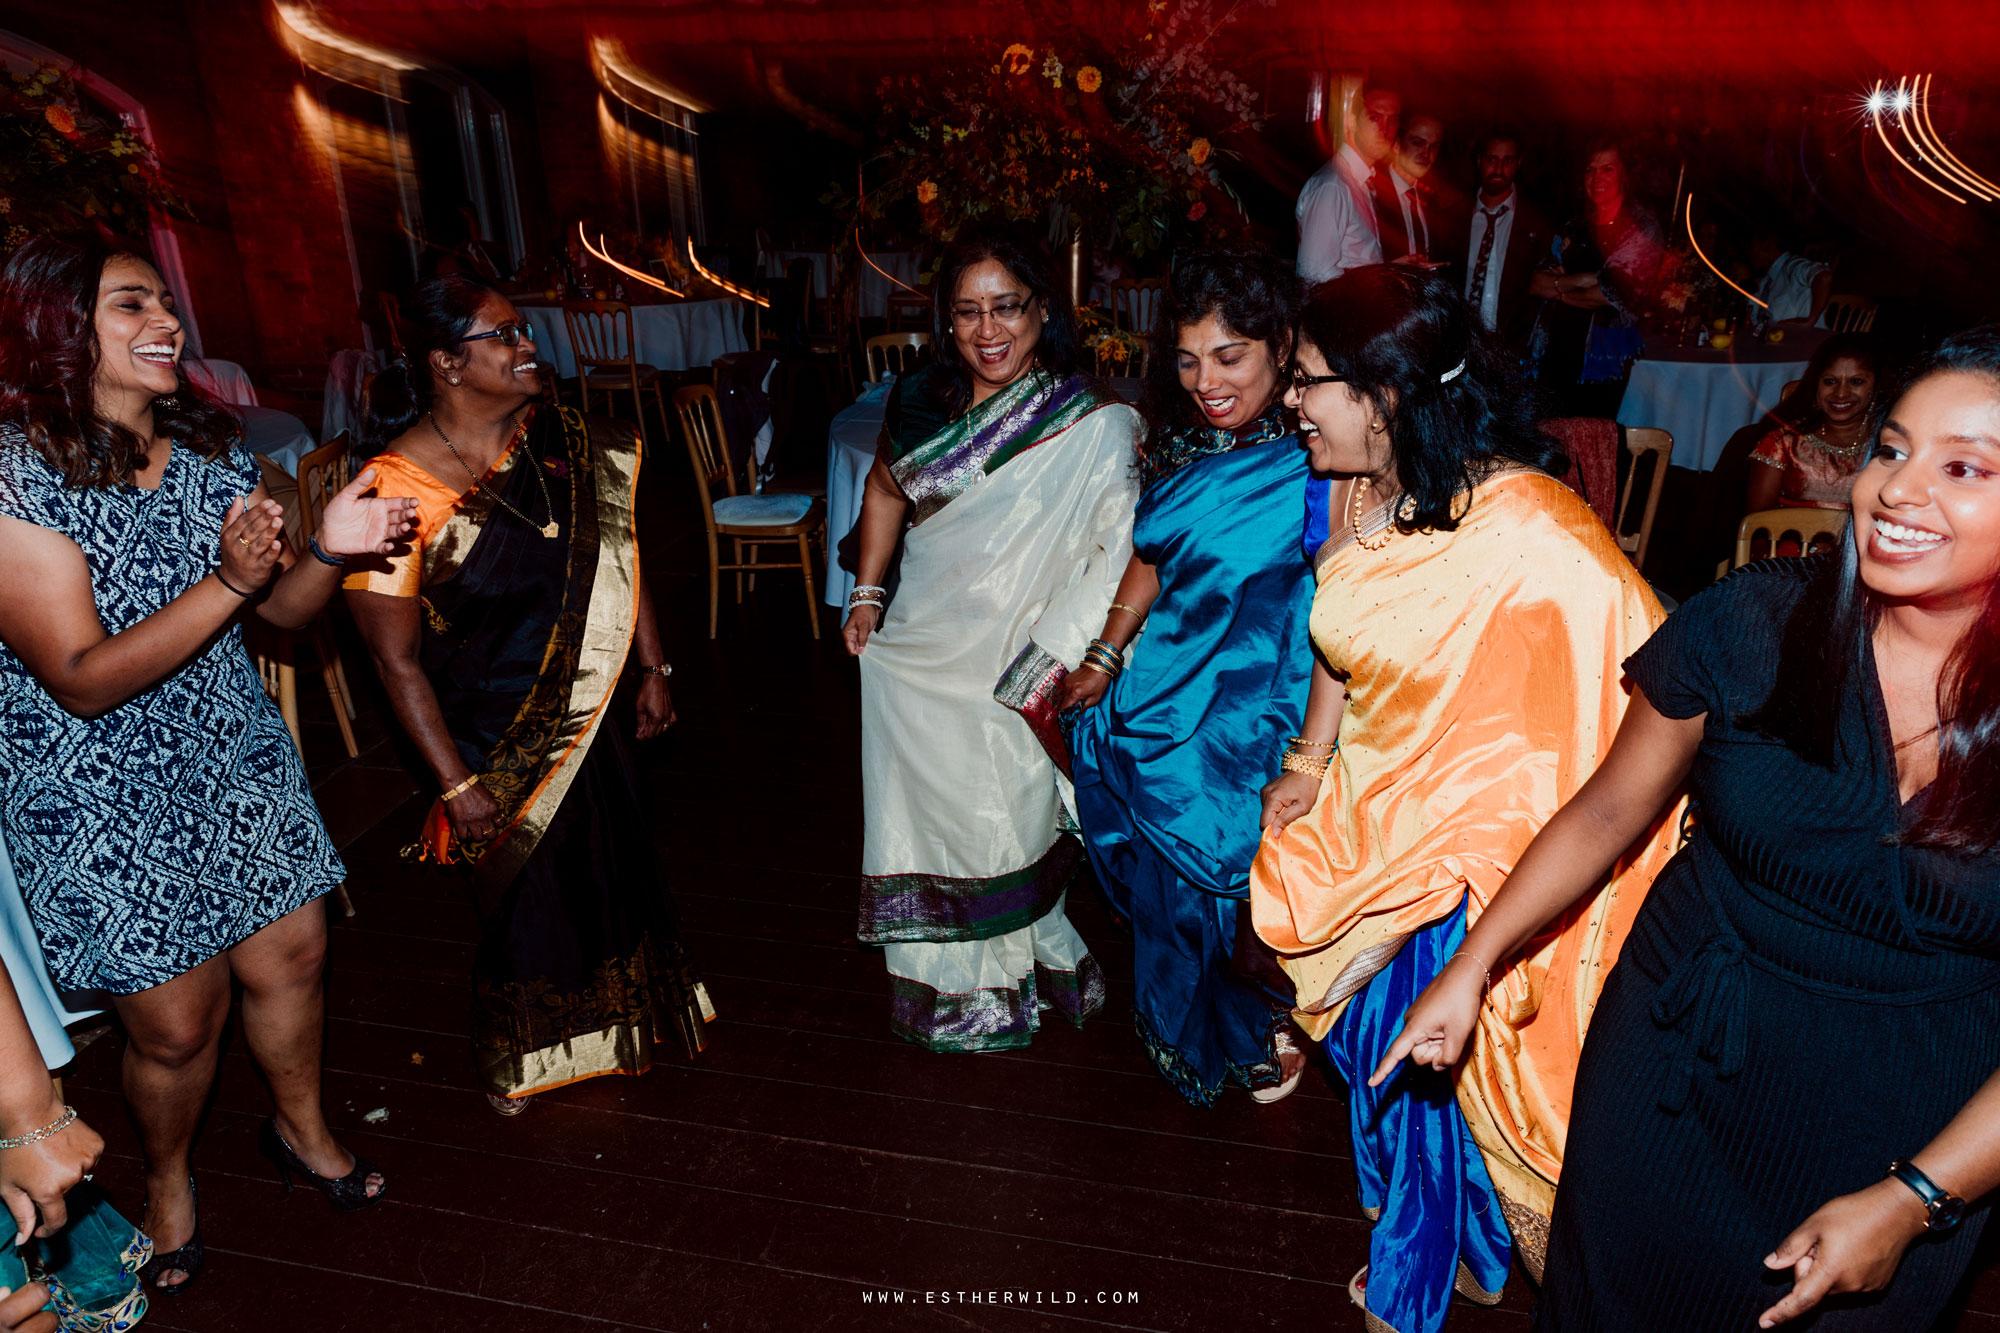 Northbrook_Park_Farnham_Surrey_London_Wedding_Hindu_Fusion_Esther_Wild_Photographer_IMG_7312.jpg